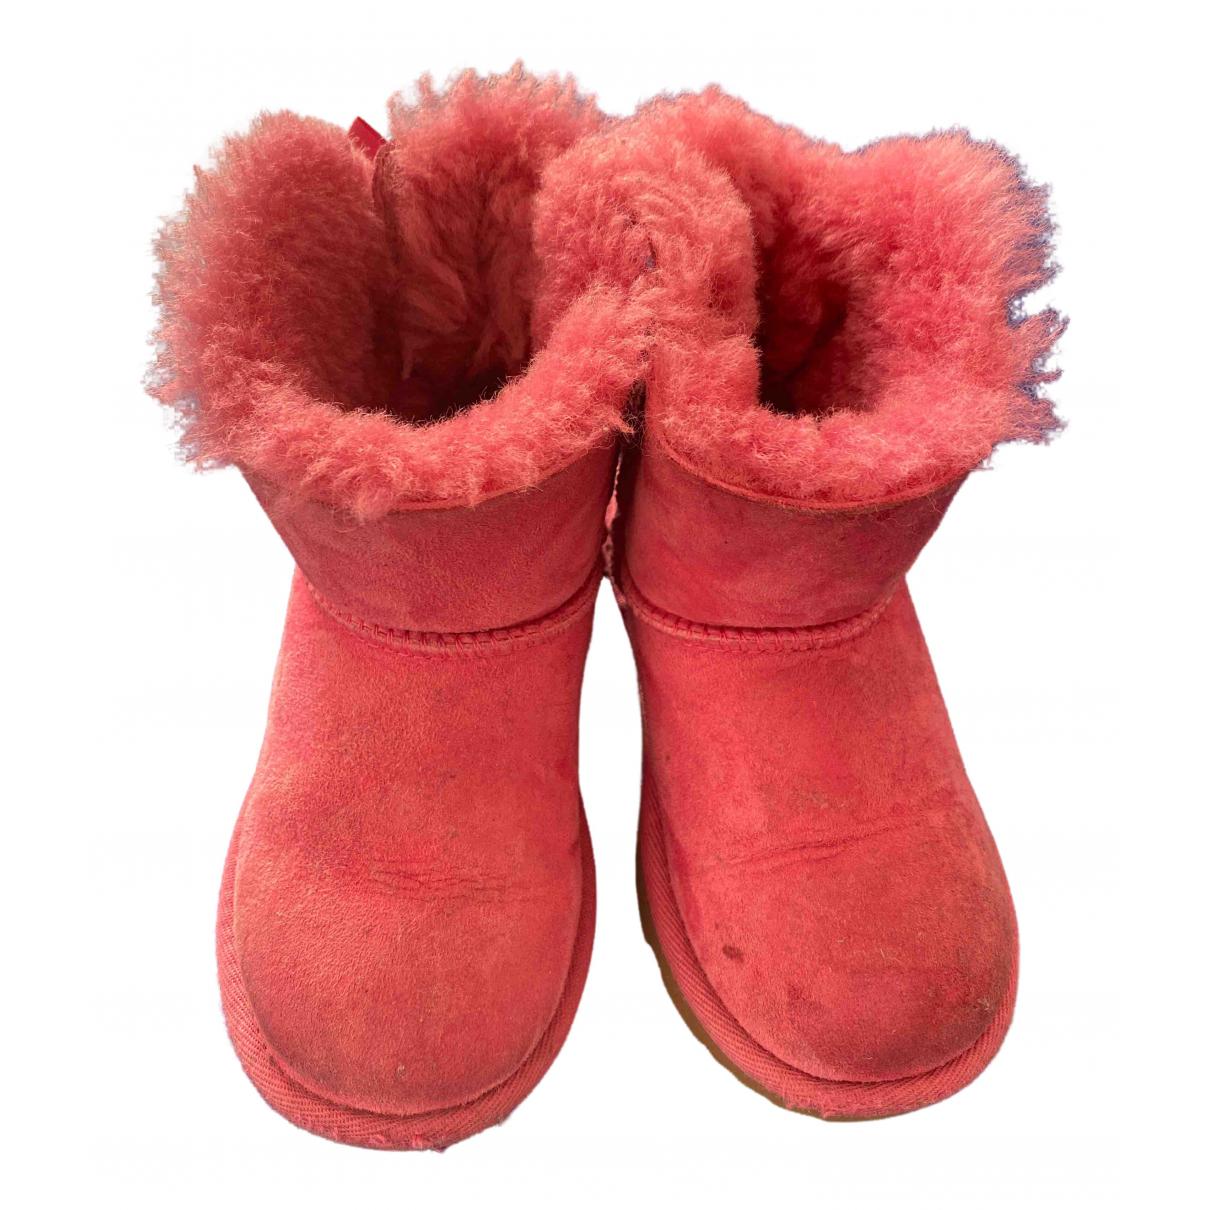 Ugg N Pink Suede Boots for Kids 27 FR